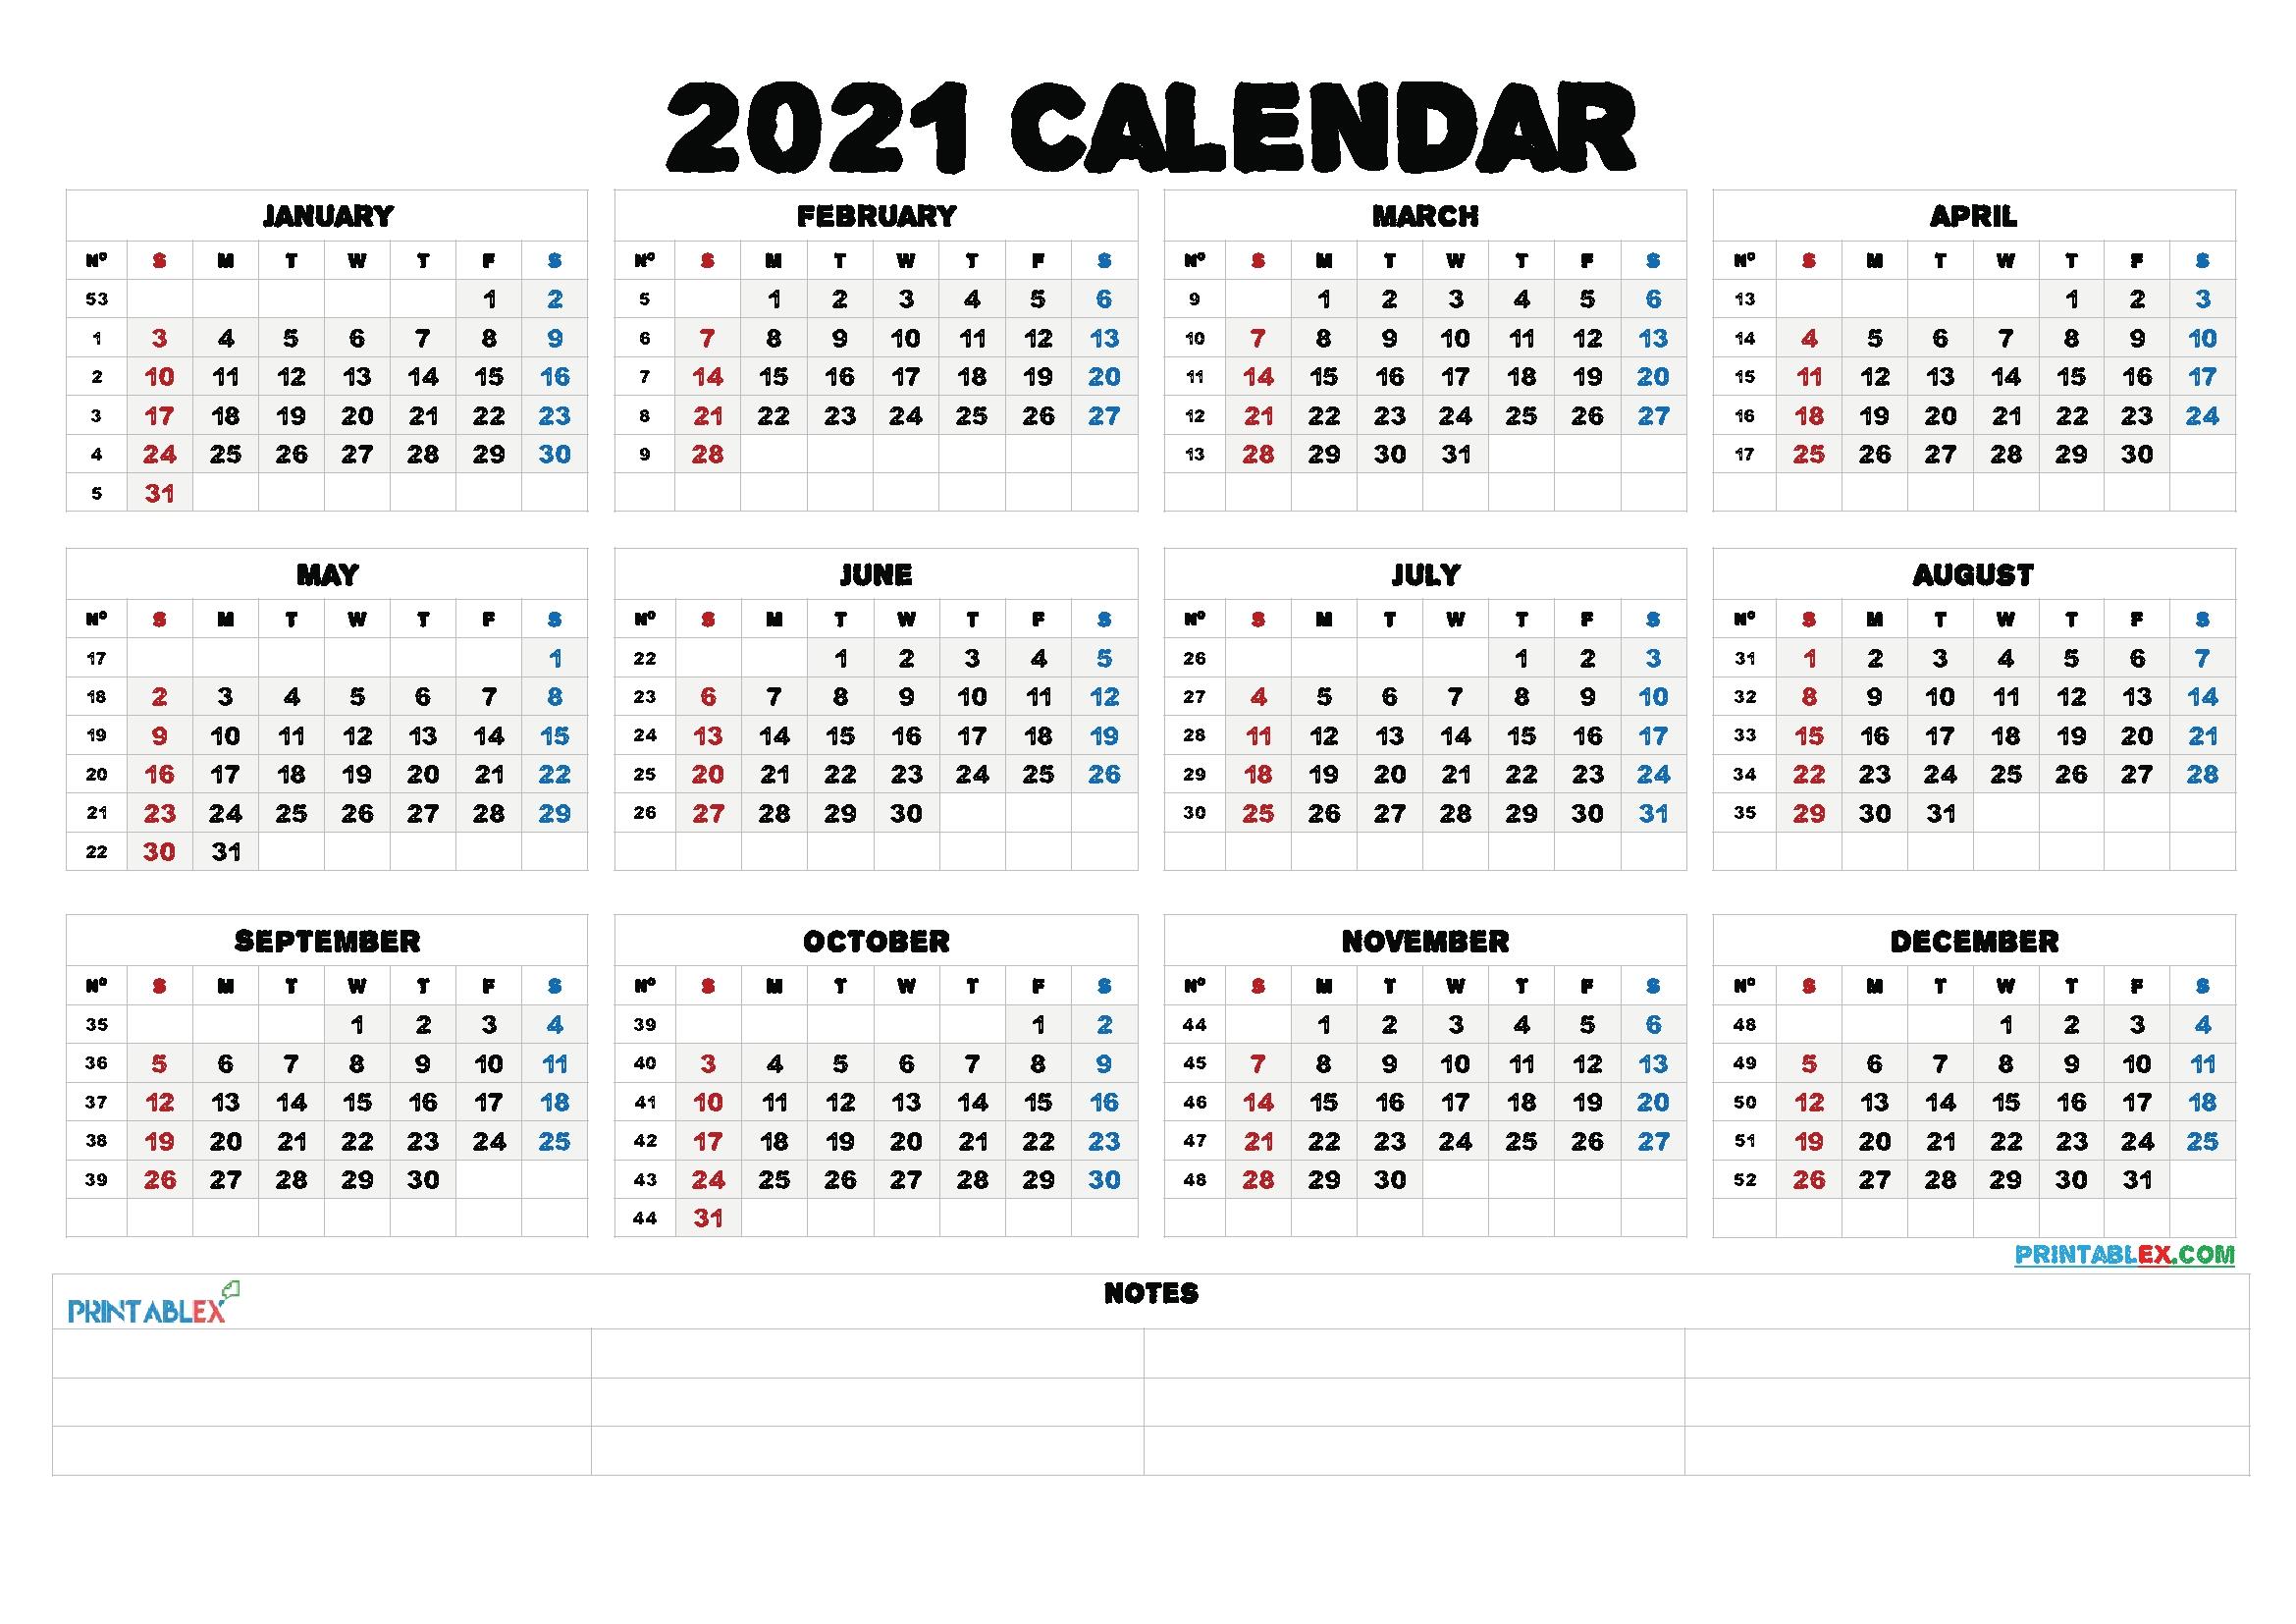 Free Editable Weekly 2021 Calendar - Free 2021 Monthly Calendar Template : Printable Blank in 2021 Free Printable Weekly Calendar Blank